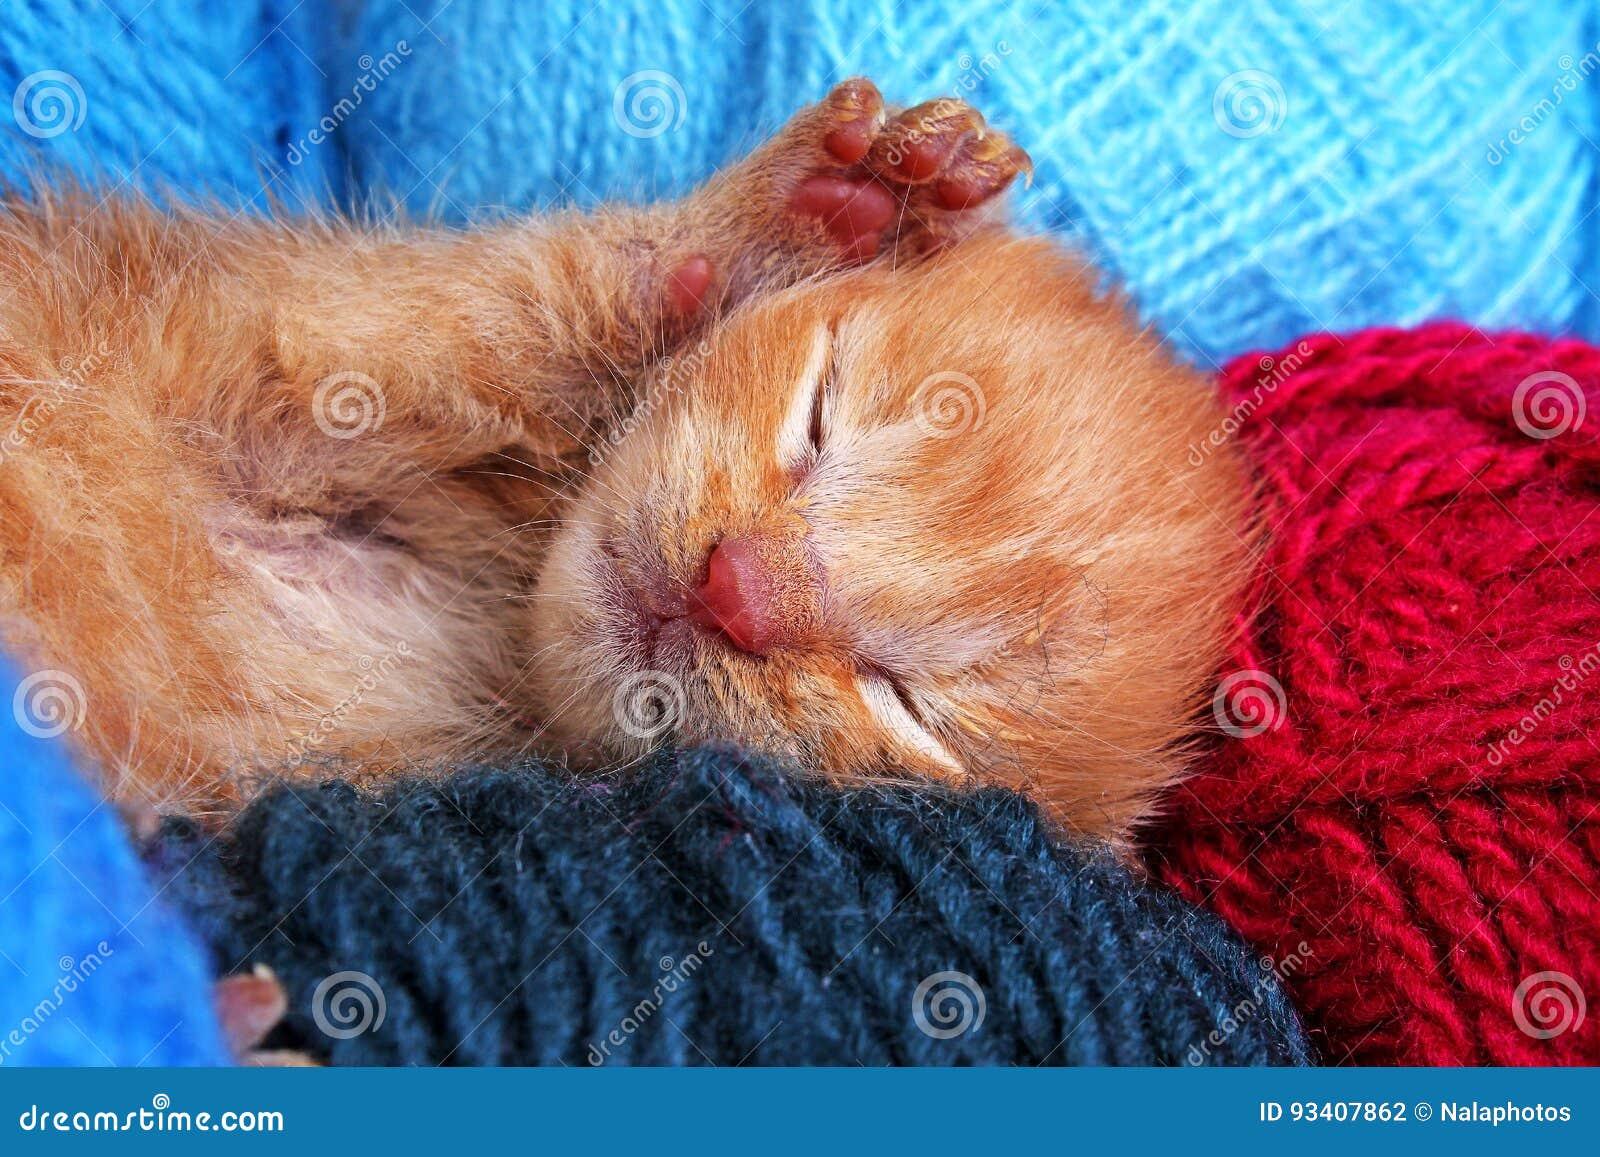 Sleeping Cat Kitten New Born Baby Cat Sleeping Cute Beautiful Little Few Days Old Orange Cream Color Kitten Stock Photo Image Of Sleeping Photo 93407862